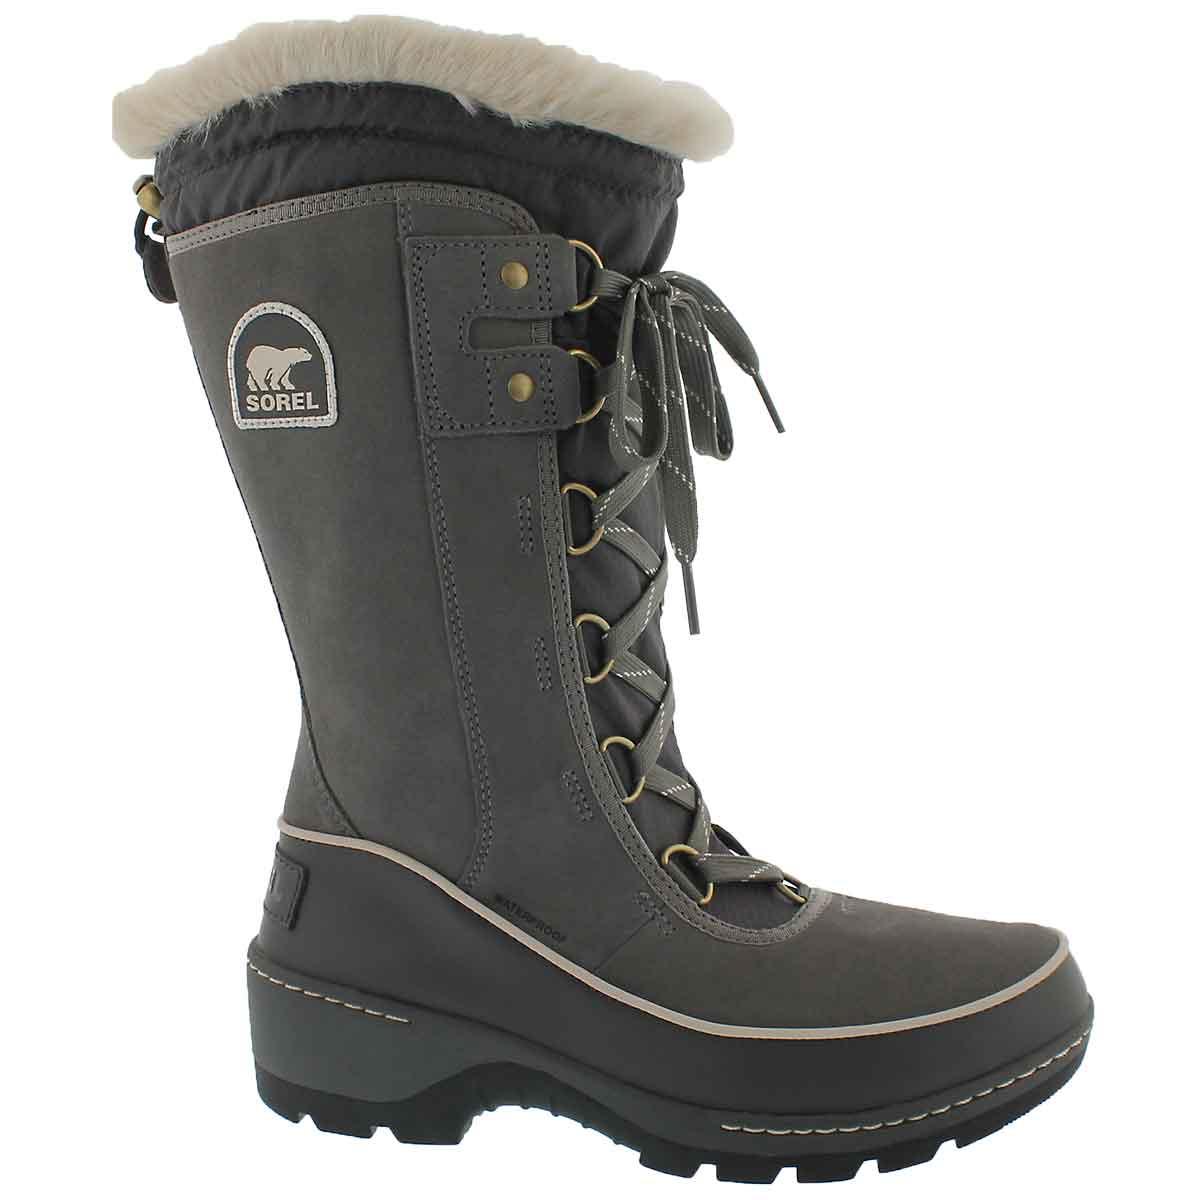 Lds Tivoli III High quarry wtpf boot